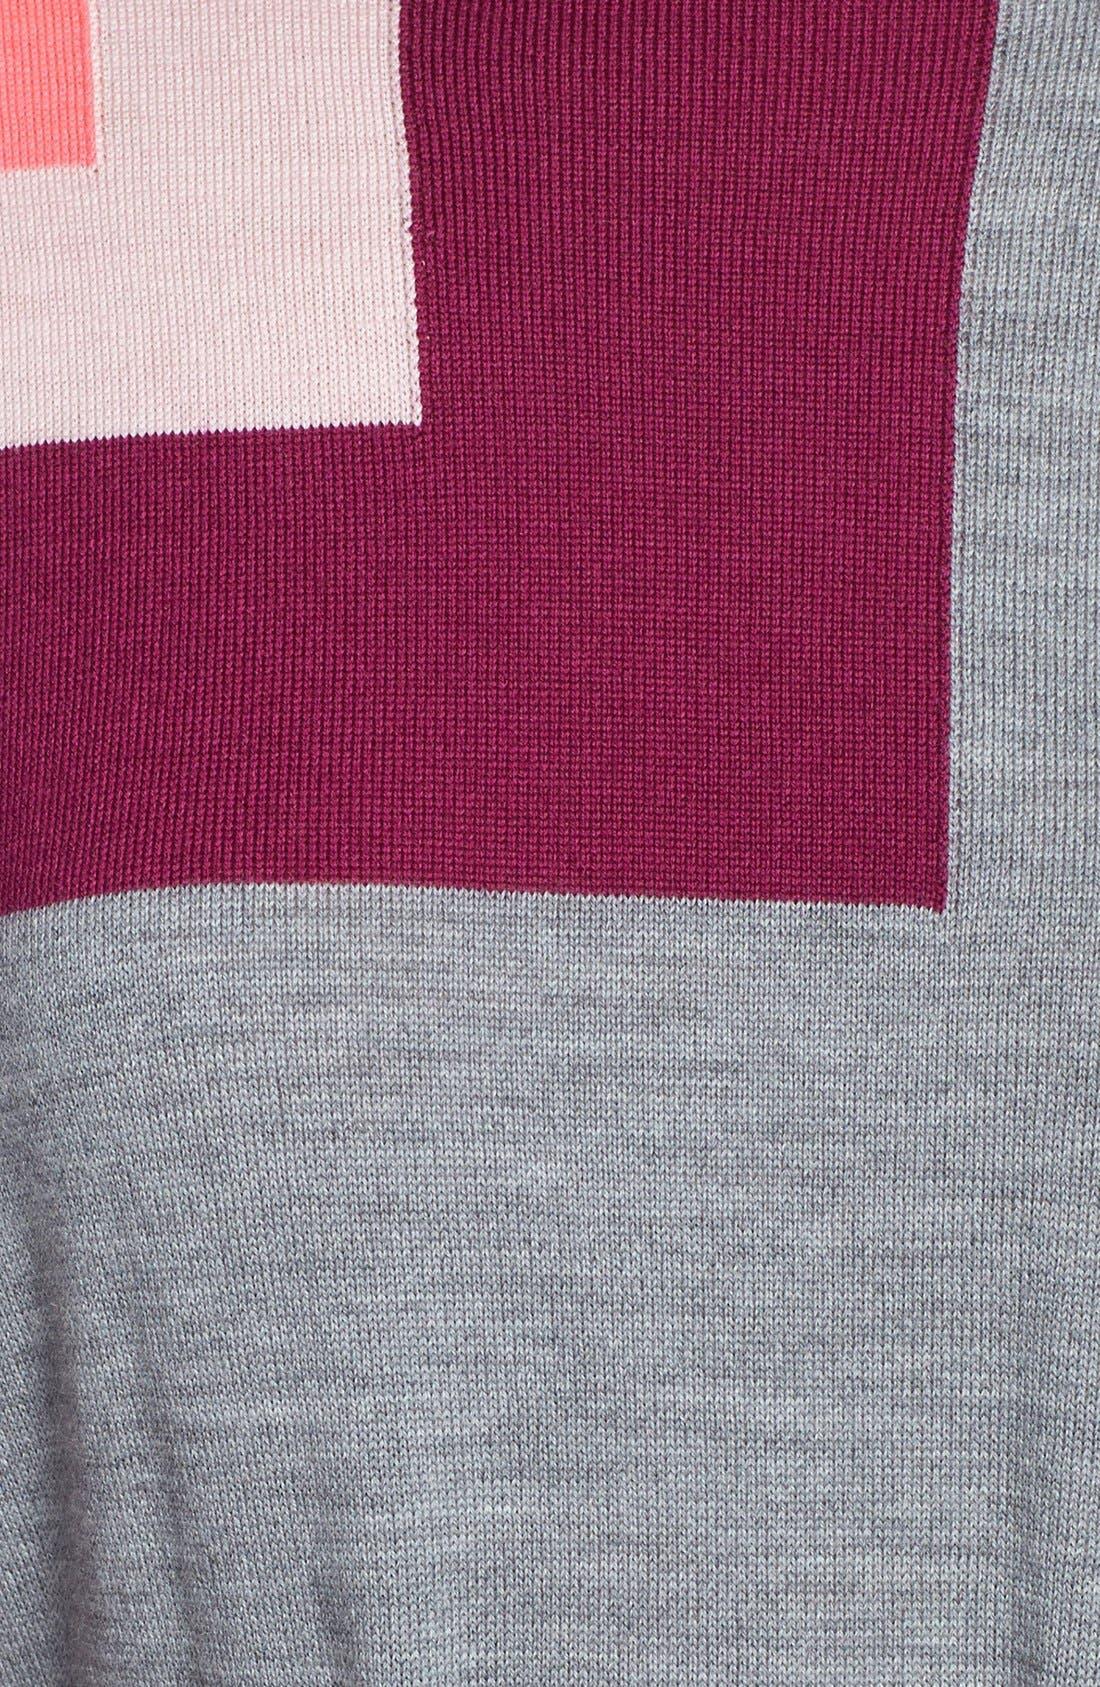 Alternate Image 4  - Trina Turk 'Bonaire' Colorblock Merino Sweater Dress